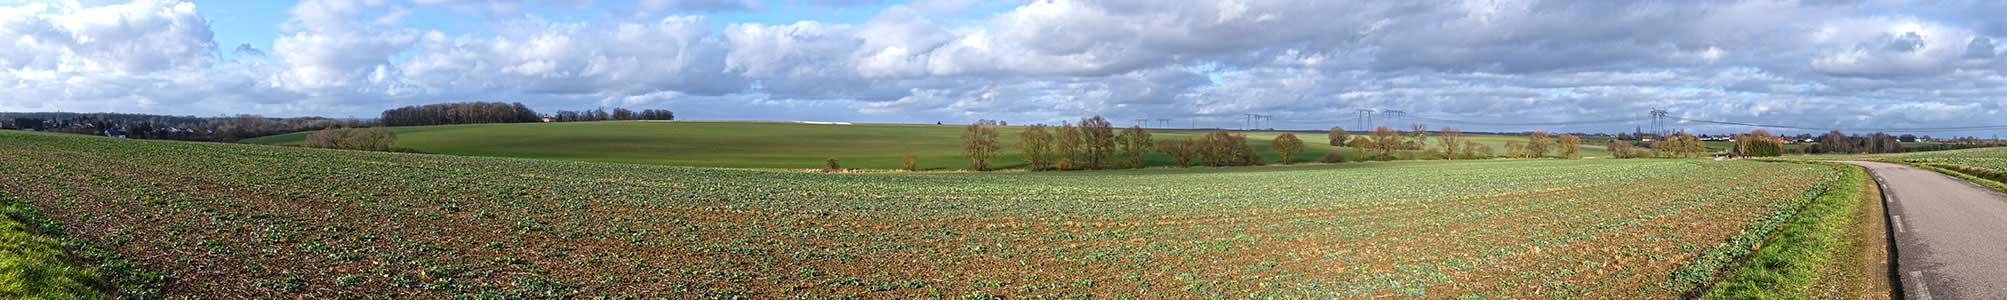 jakobsweg panorama